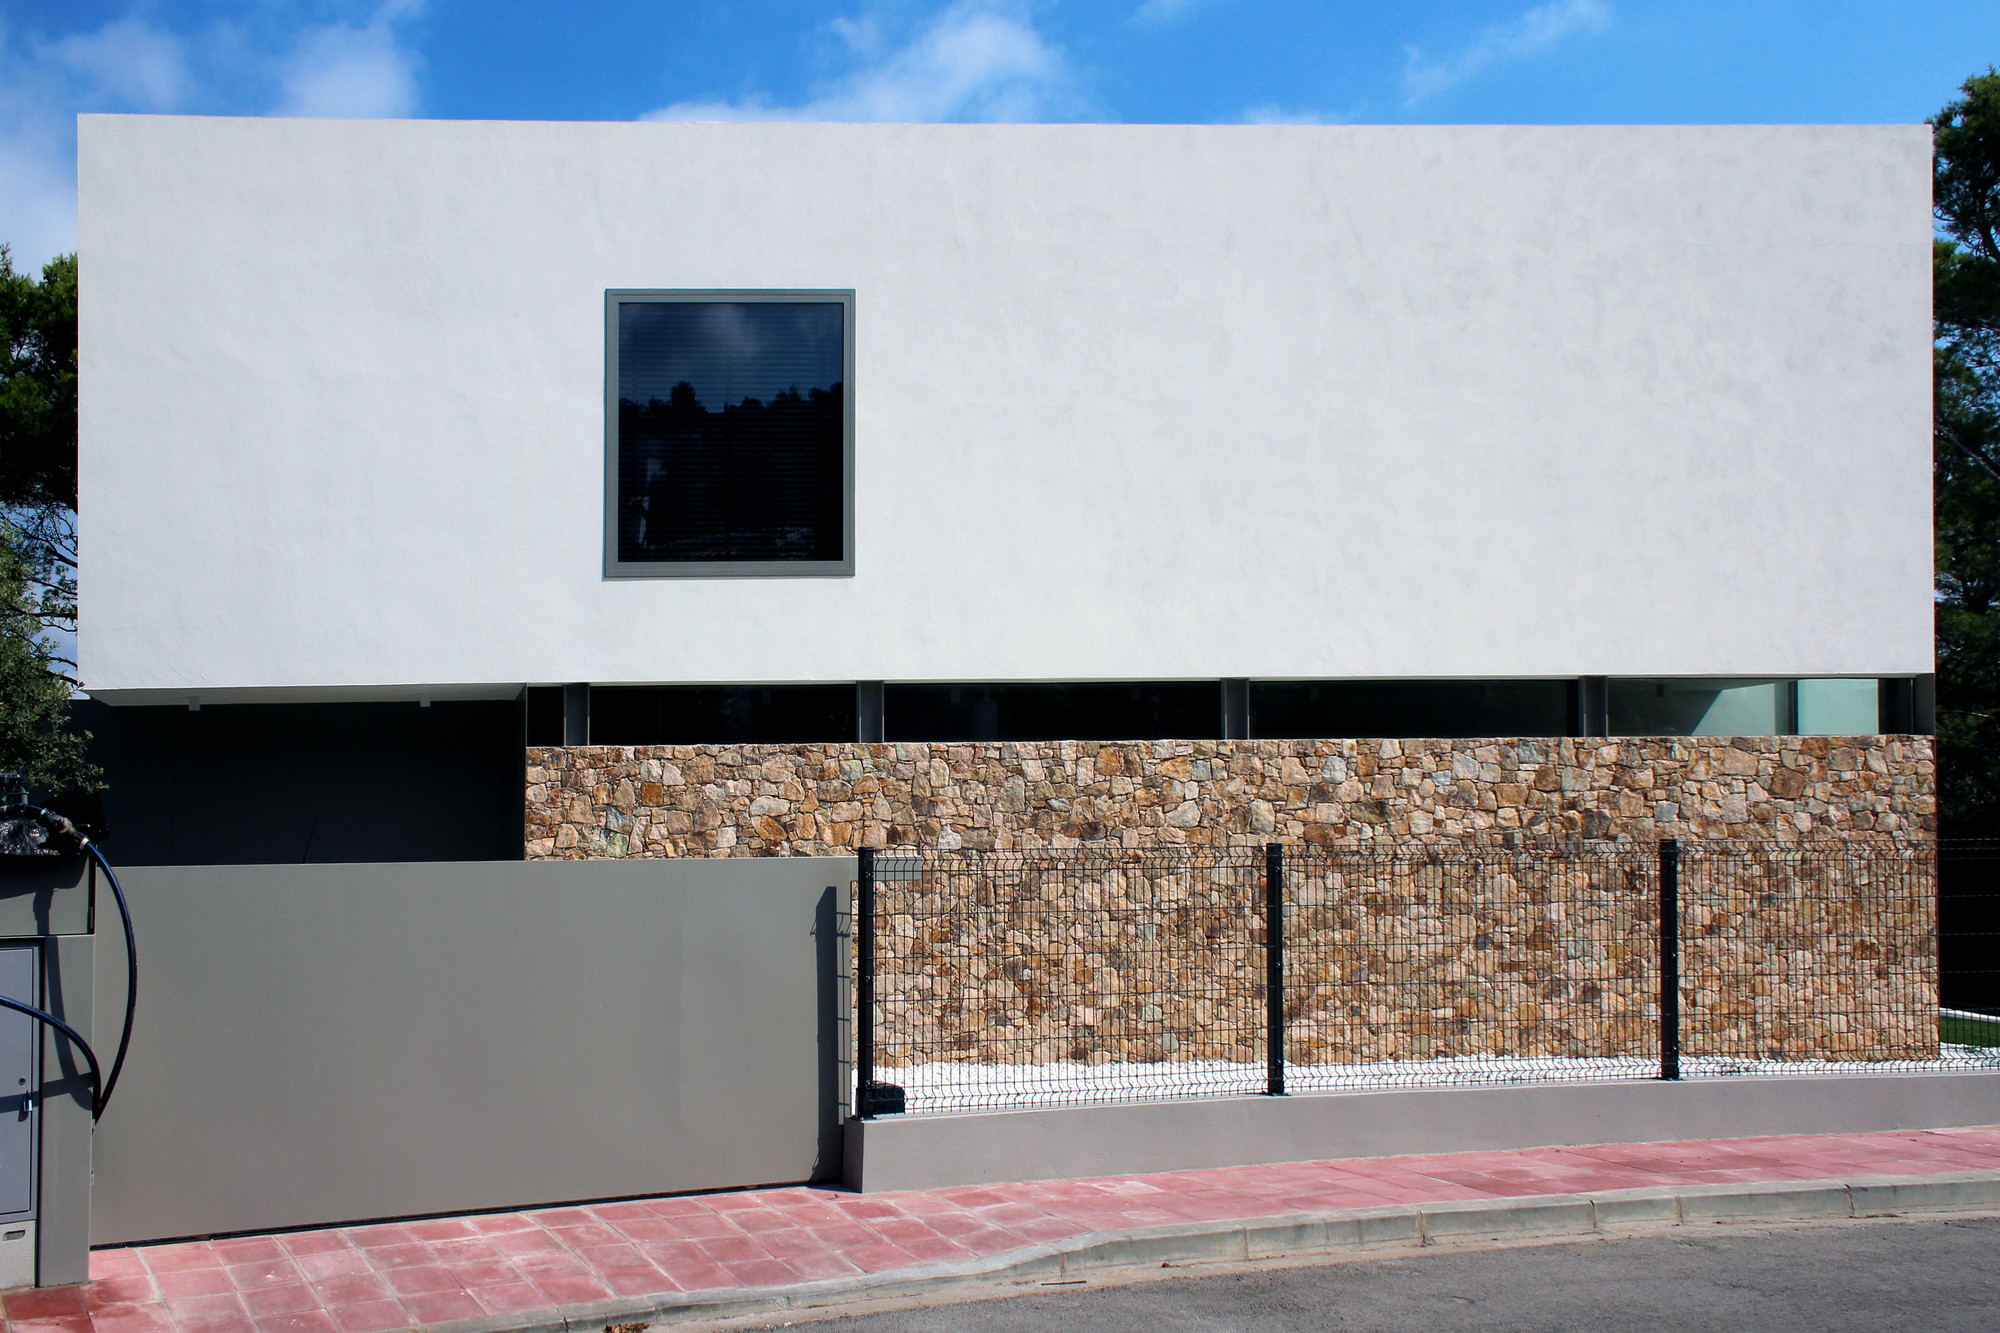 One Family Dwelling / Rob Dubois, Courtesy of Rob Dubois